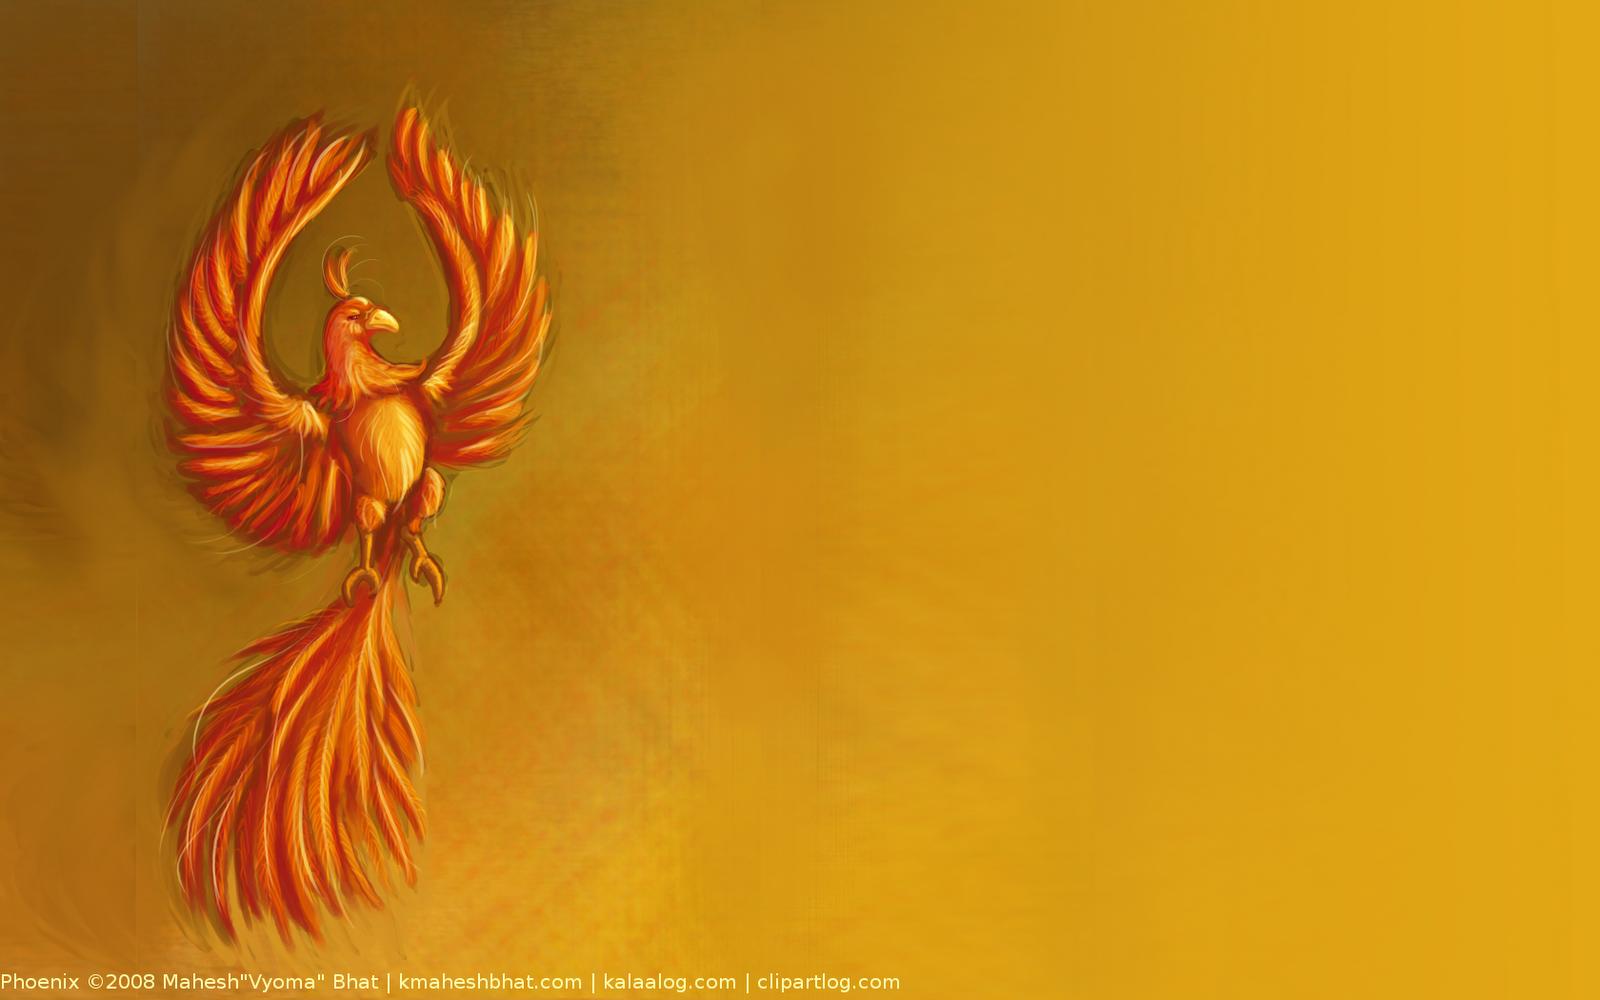 Phoenix wallpaper wallpaper for desktop - Fenix bird hd images ...